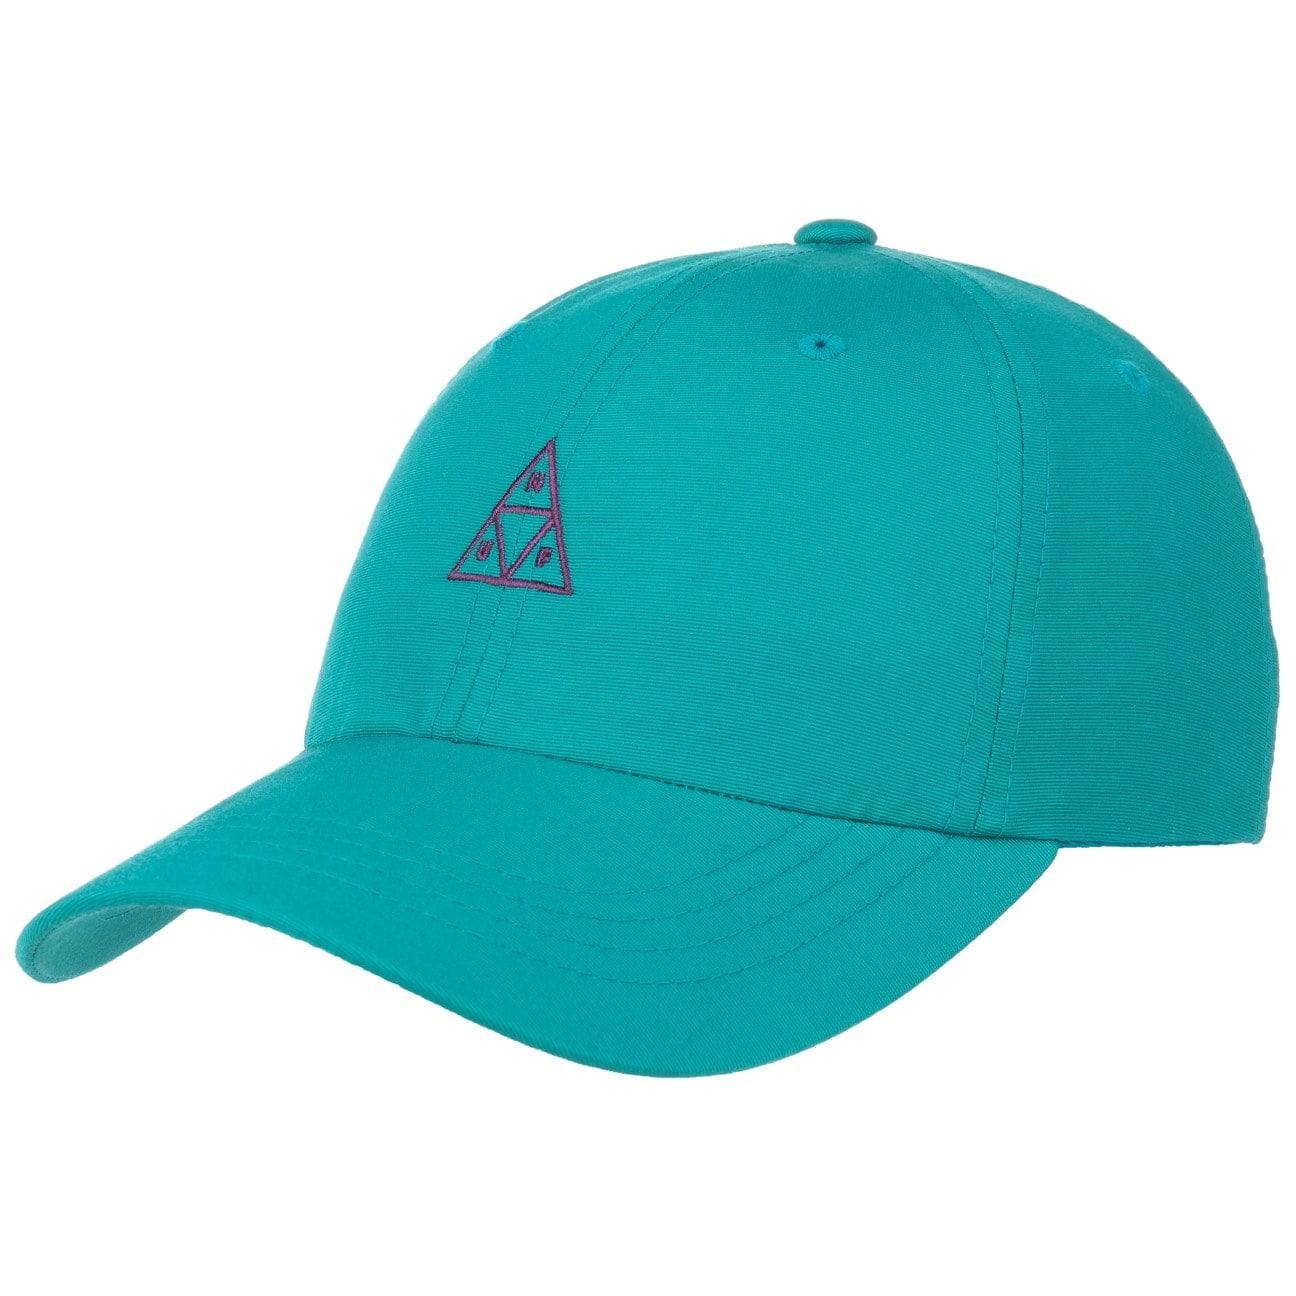 trip-tri-curved-strapback-cap-by-huf-basecap